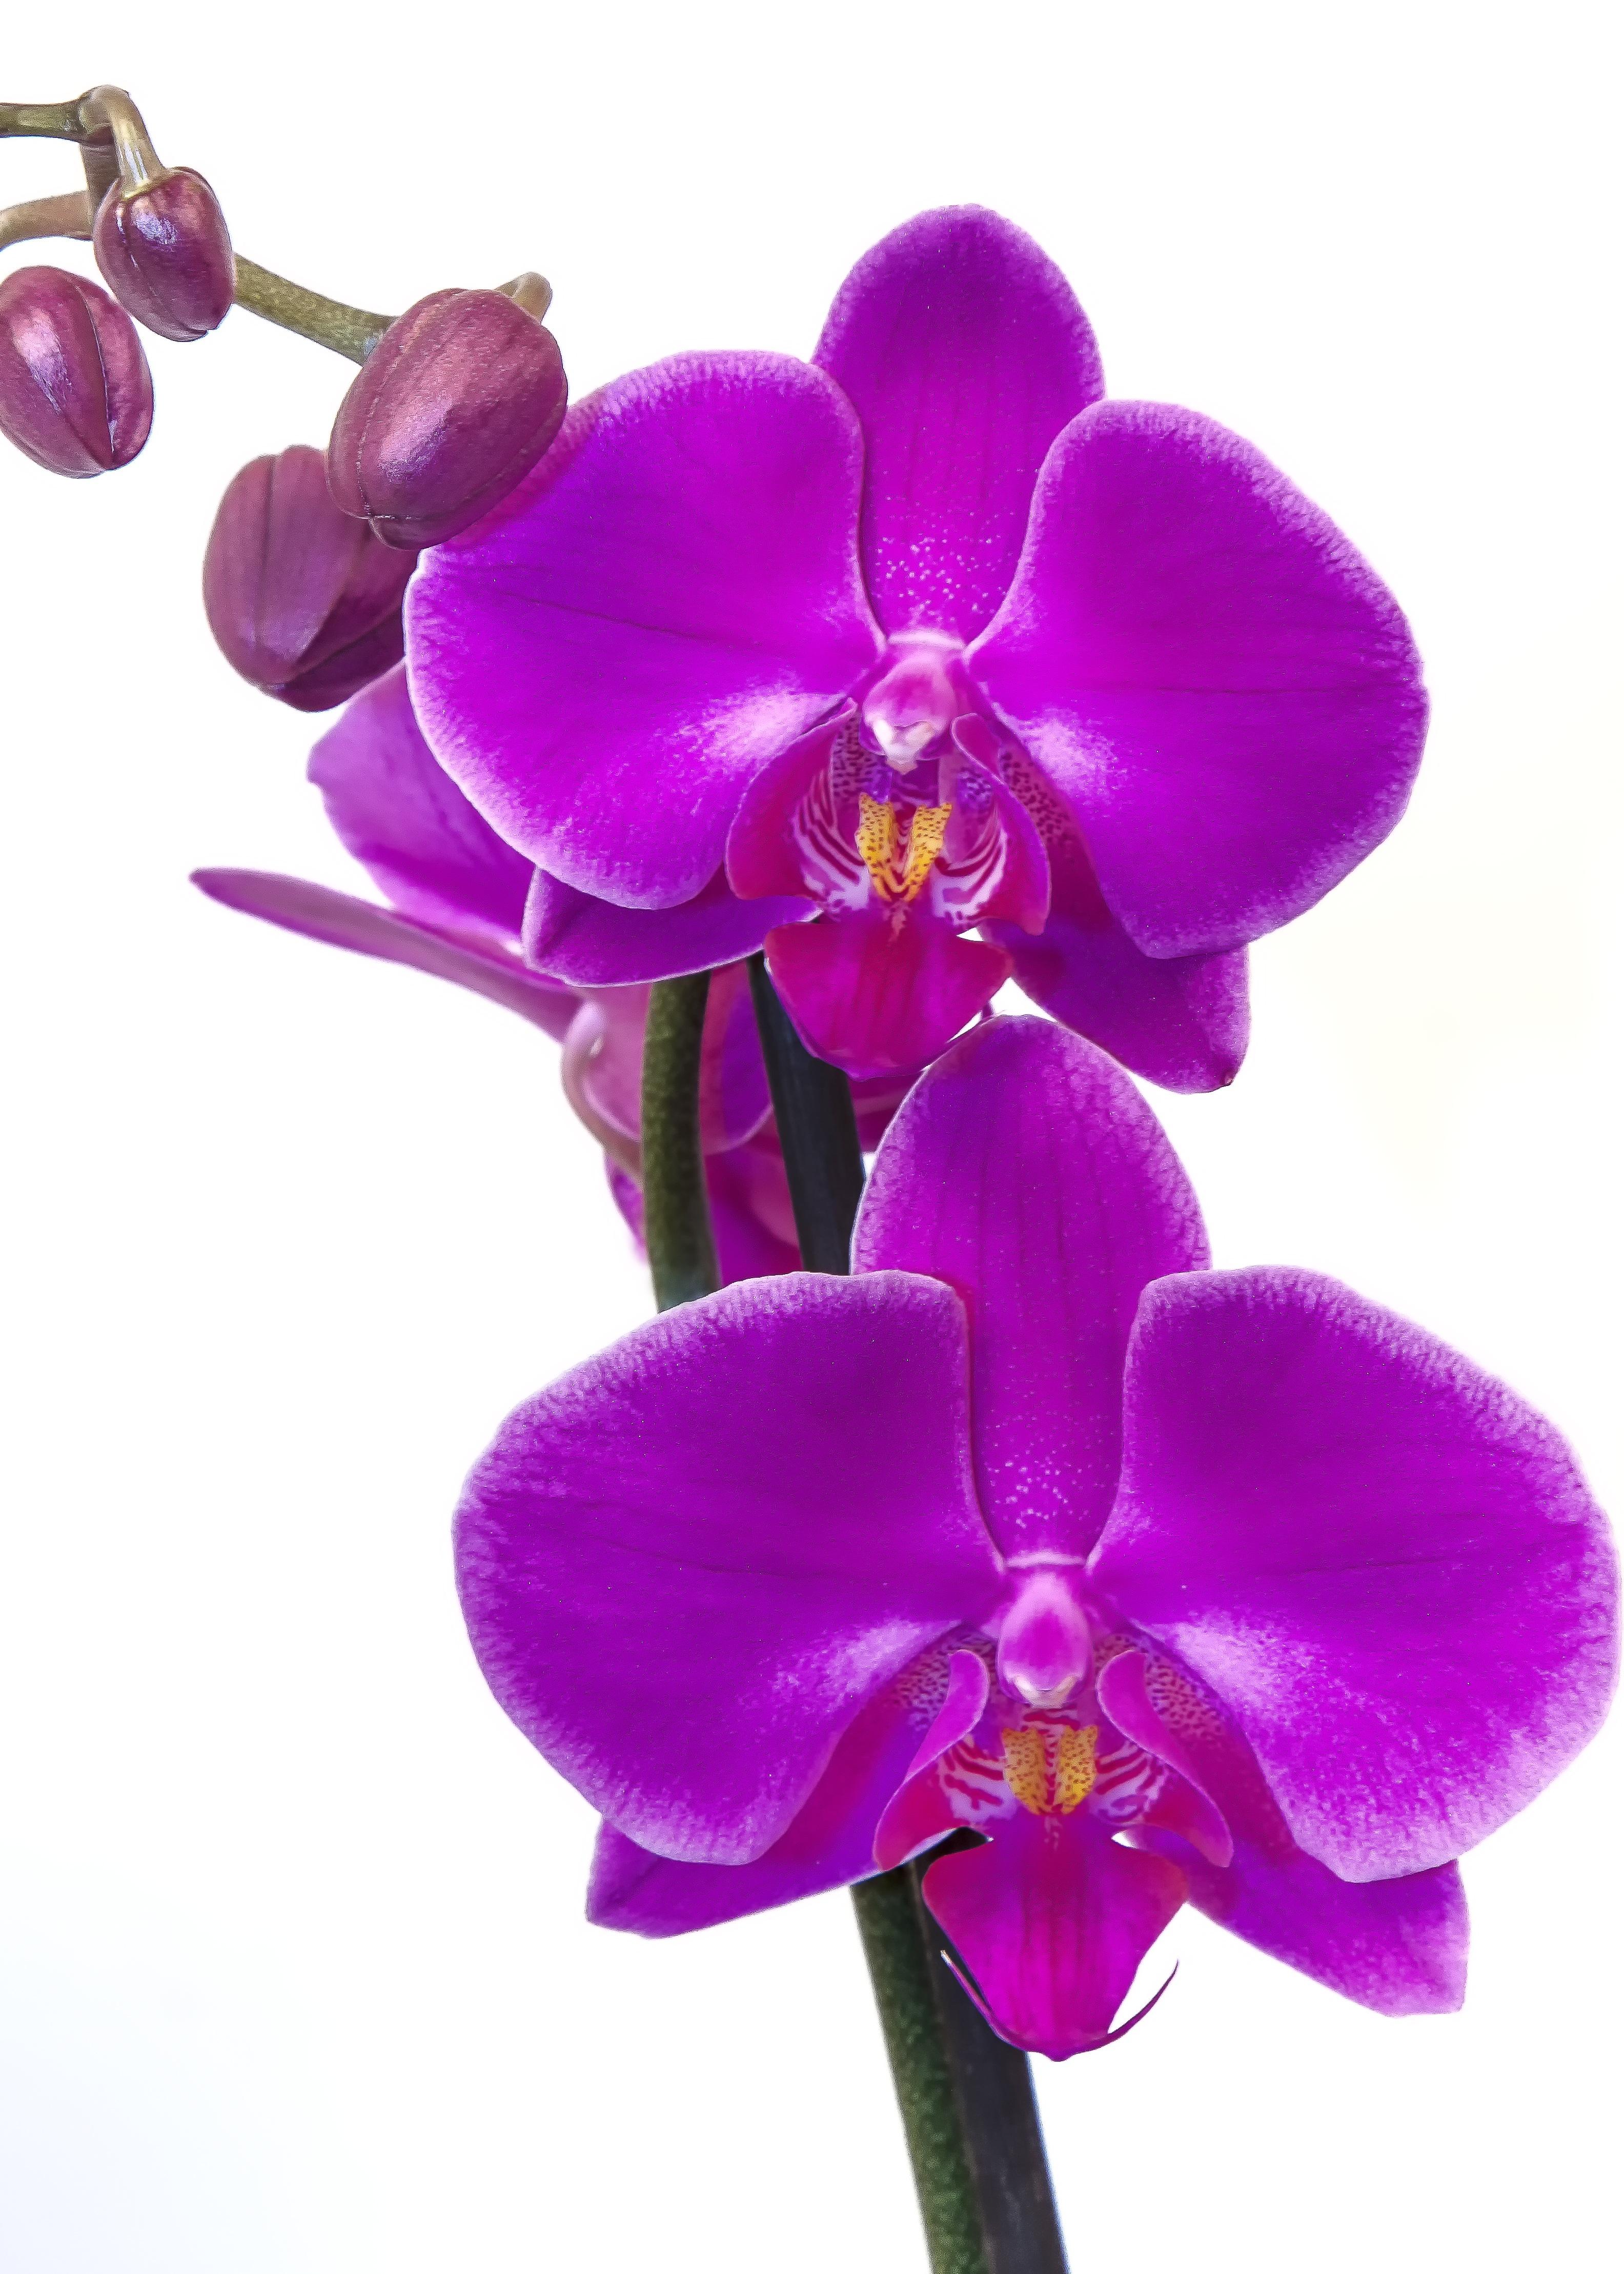 Free Images Blossom Flower Purple Petal Bloom Tropical Pink